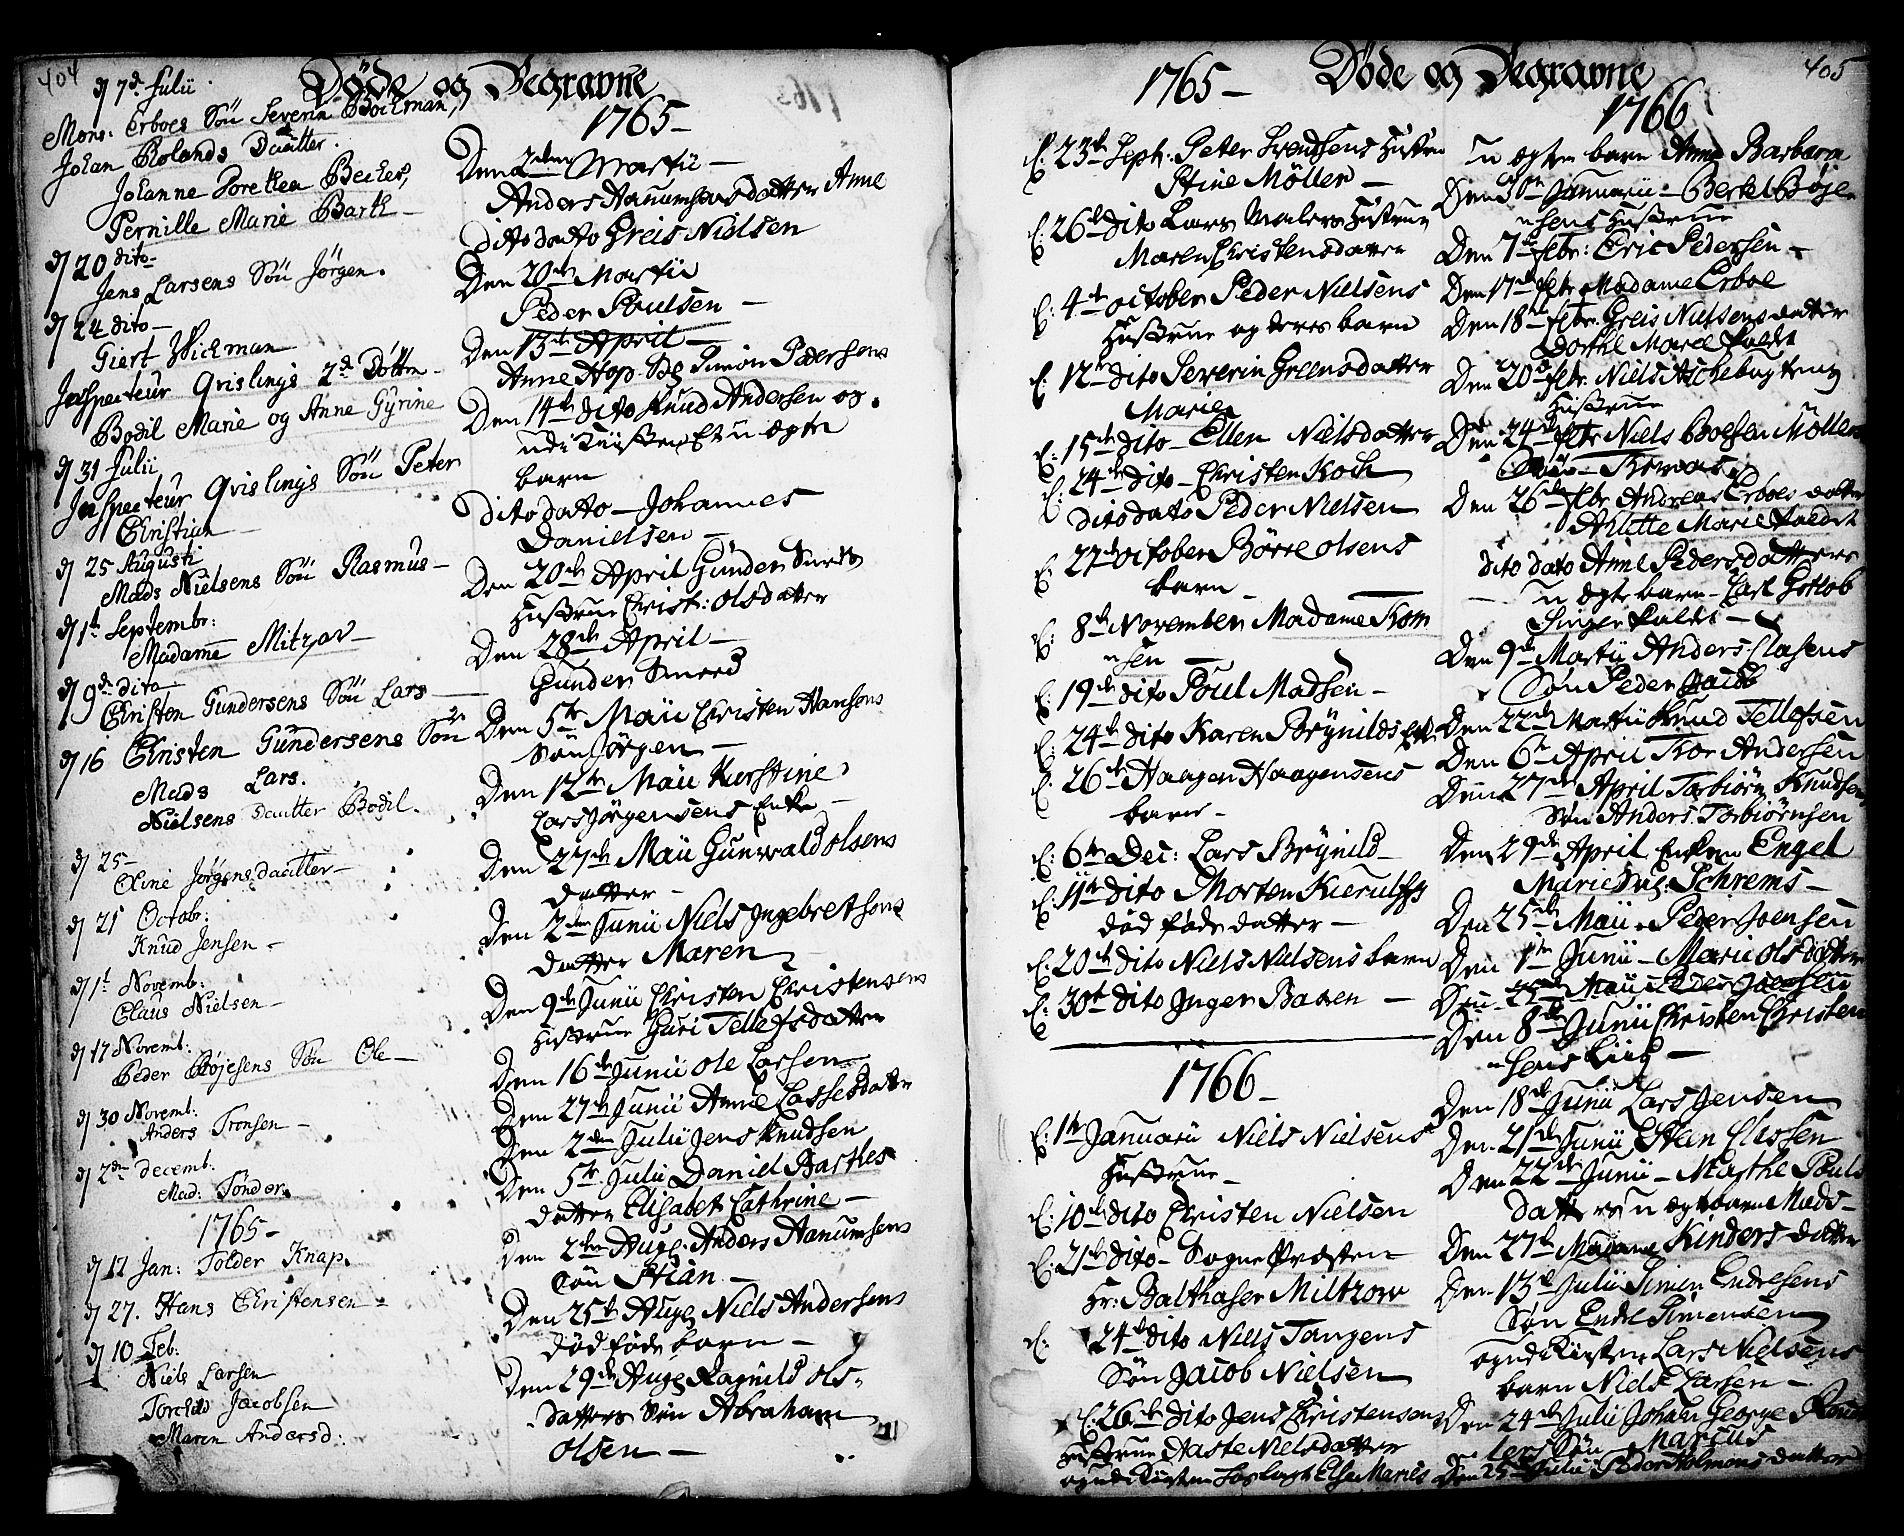 SAKO, Kragerø kirkebøker, F/Fa/L0001: Ministerialbok nr. 1, 1702-1766, s. 404-405